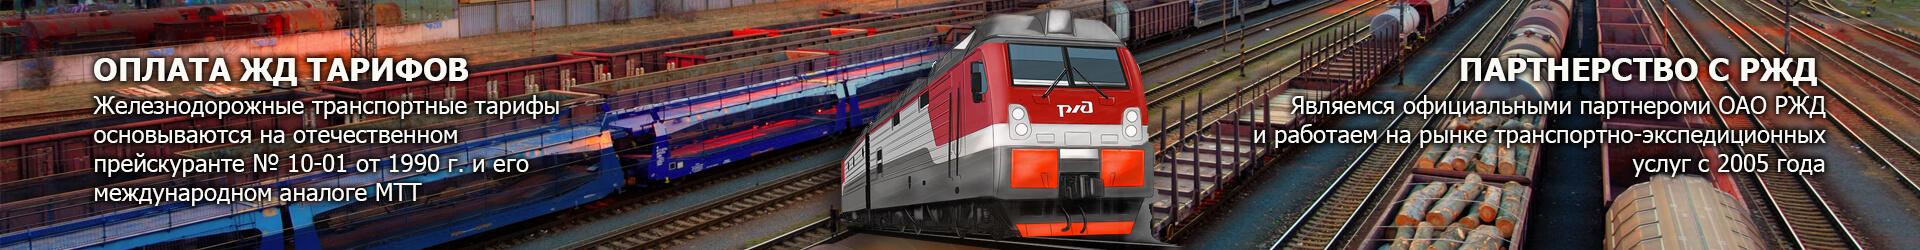 Оплата железнодорожного транспортного тарифа